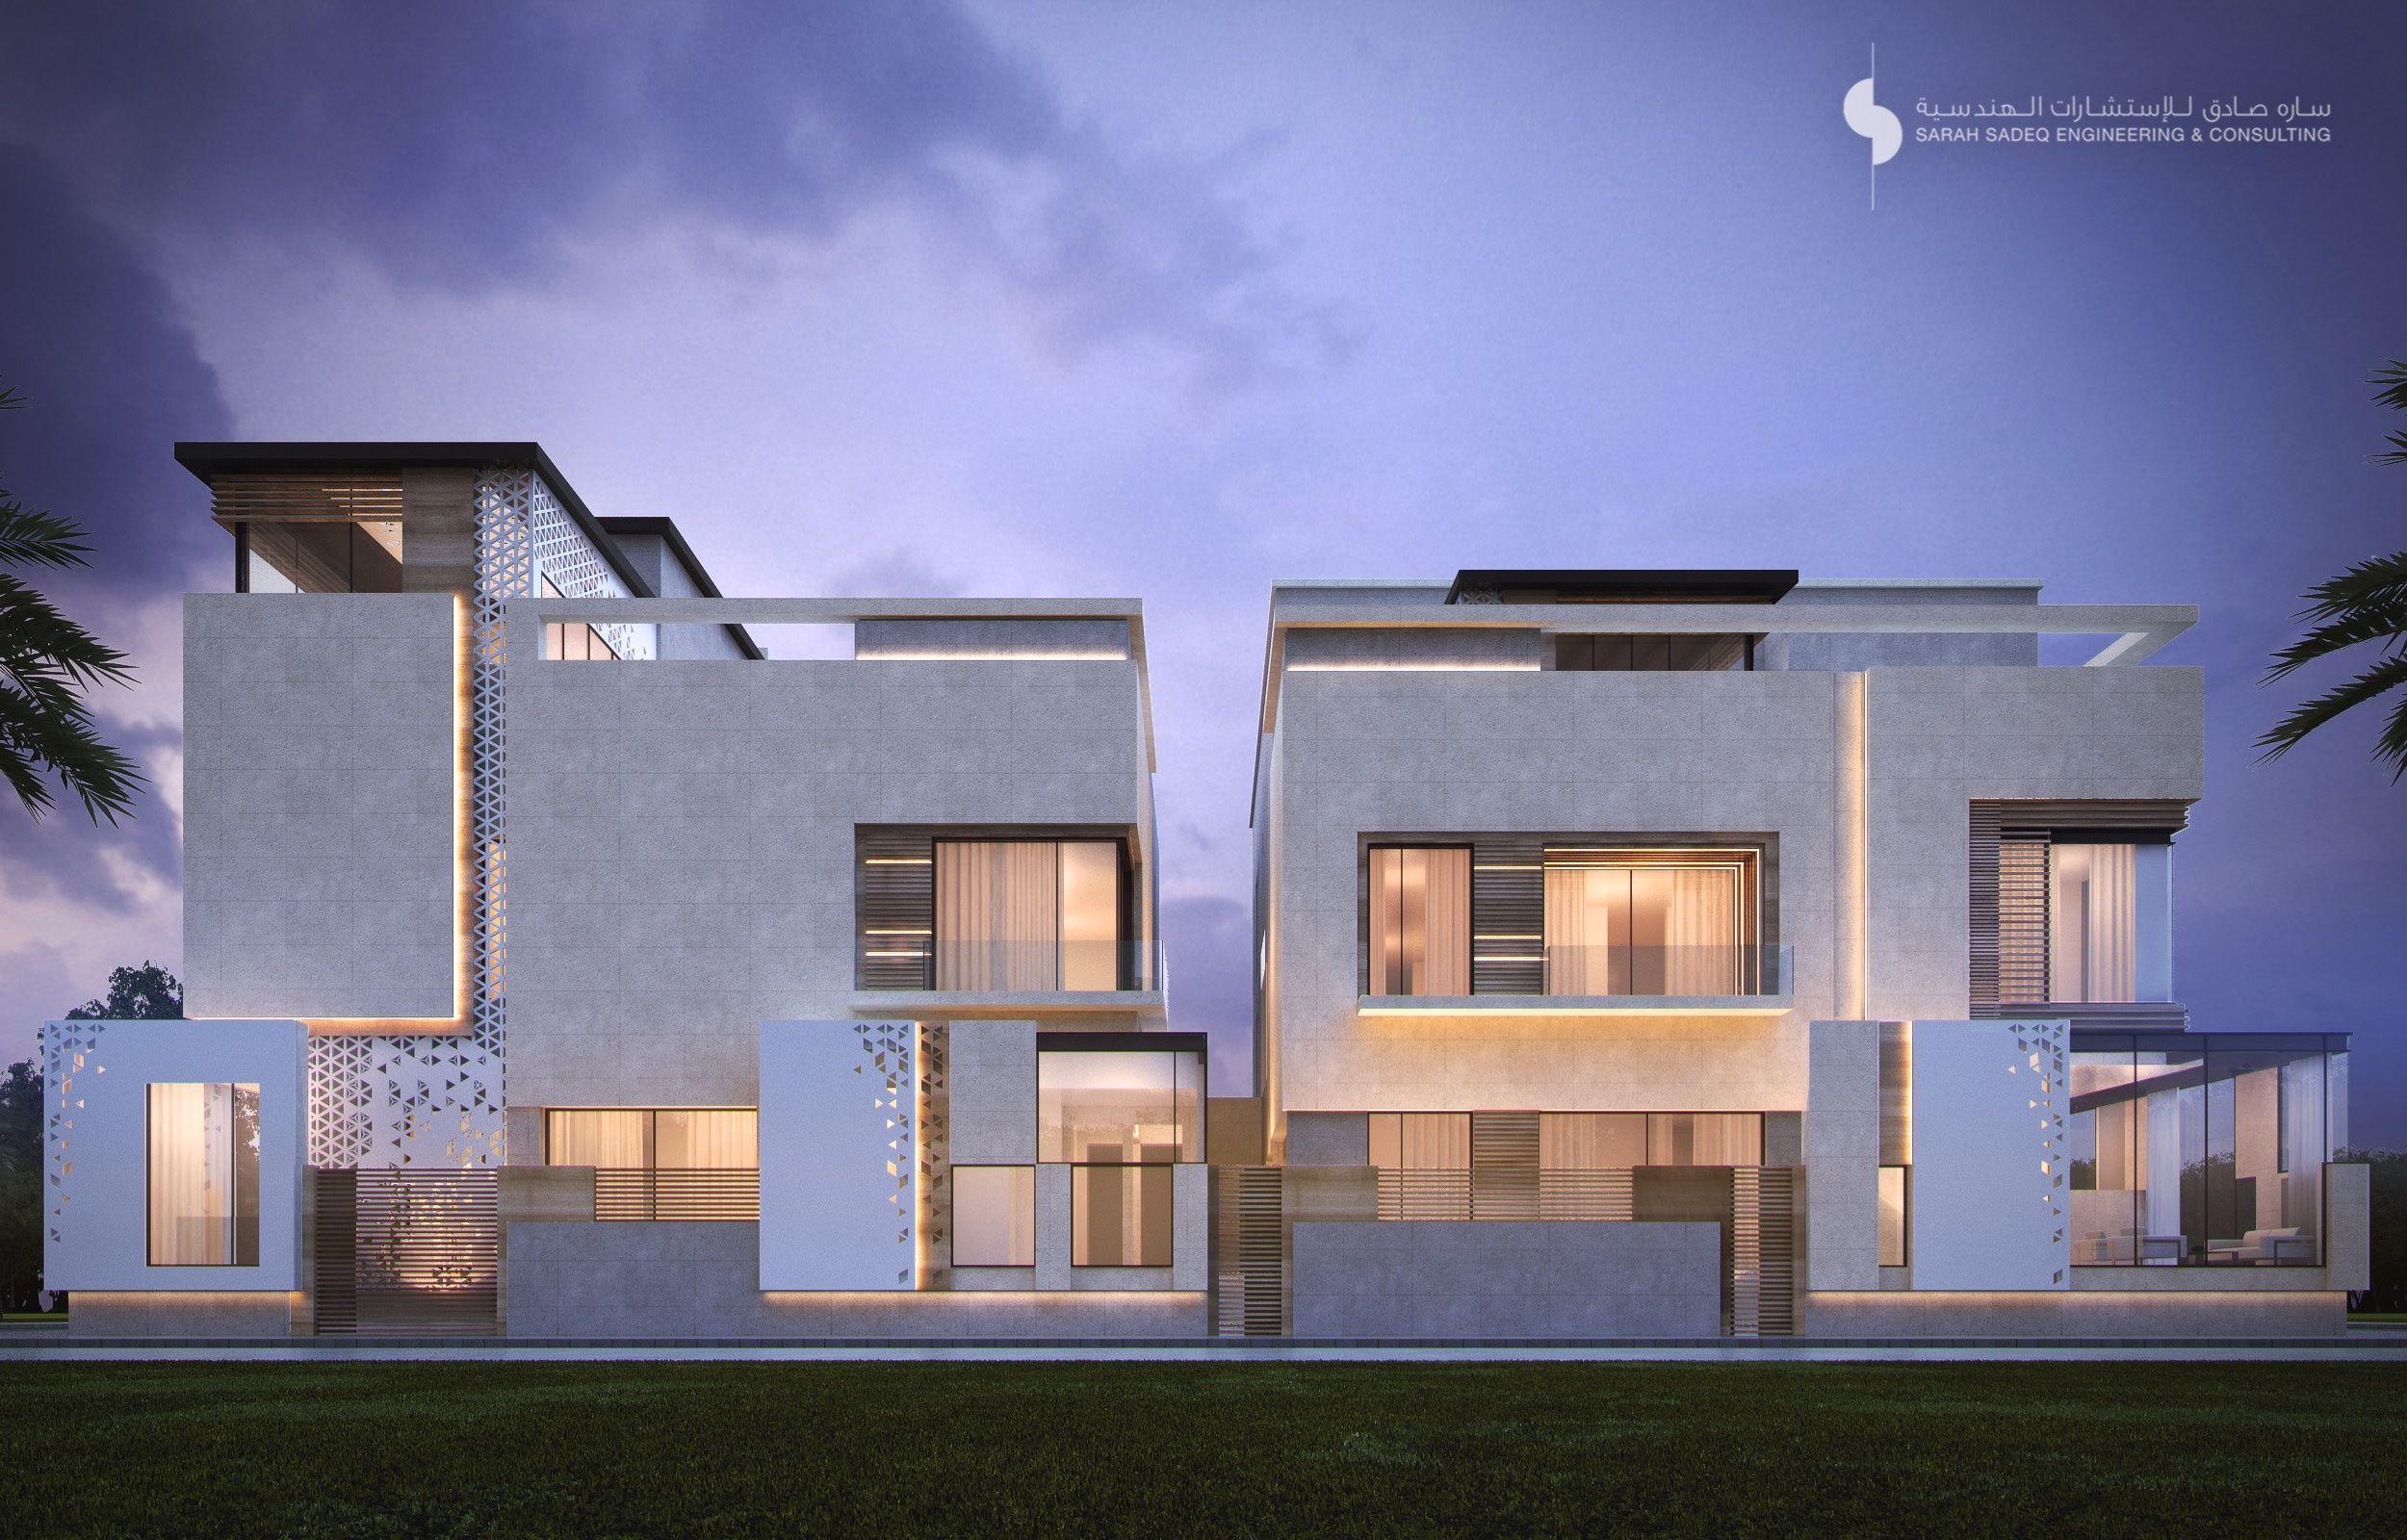 private villa 1000 m sarah sadeq architects sarah sadeq architectes pinterest architecture. Black Bedroom Furniture Sets. Home Design Ideas